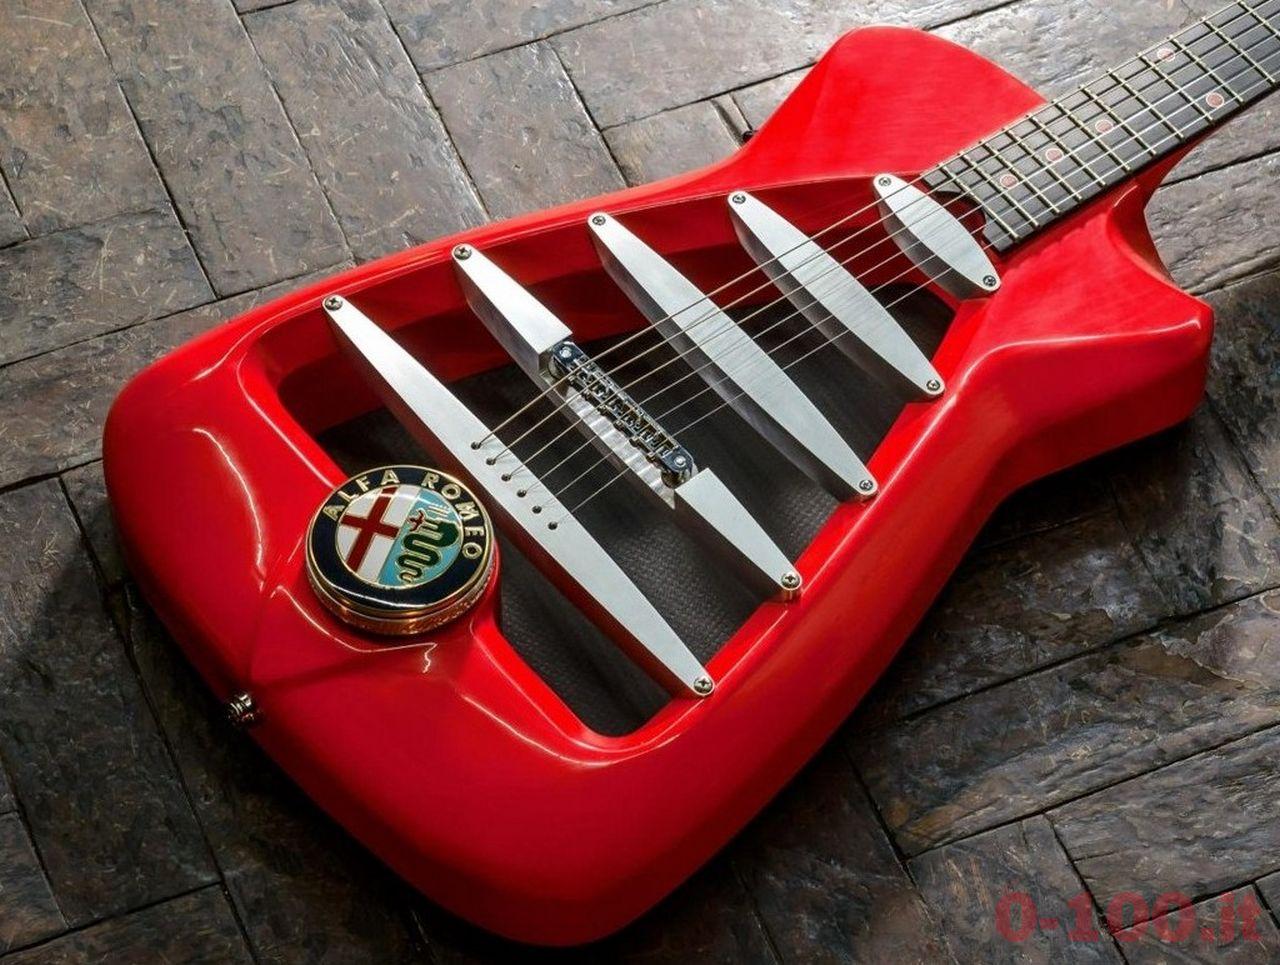 alfa-romeo-guitar-harrison-custom-guitar-works-104-anni-biscione_0-1005